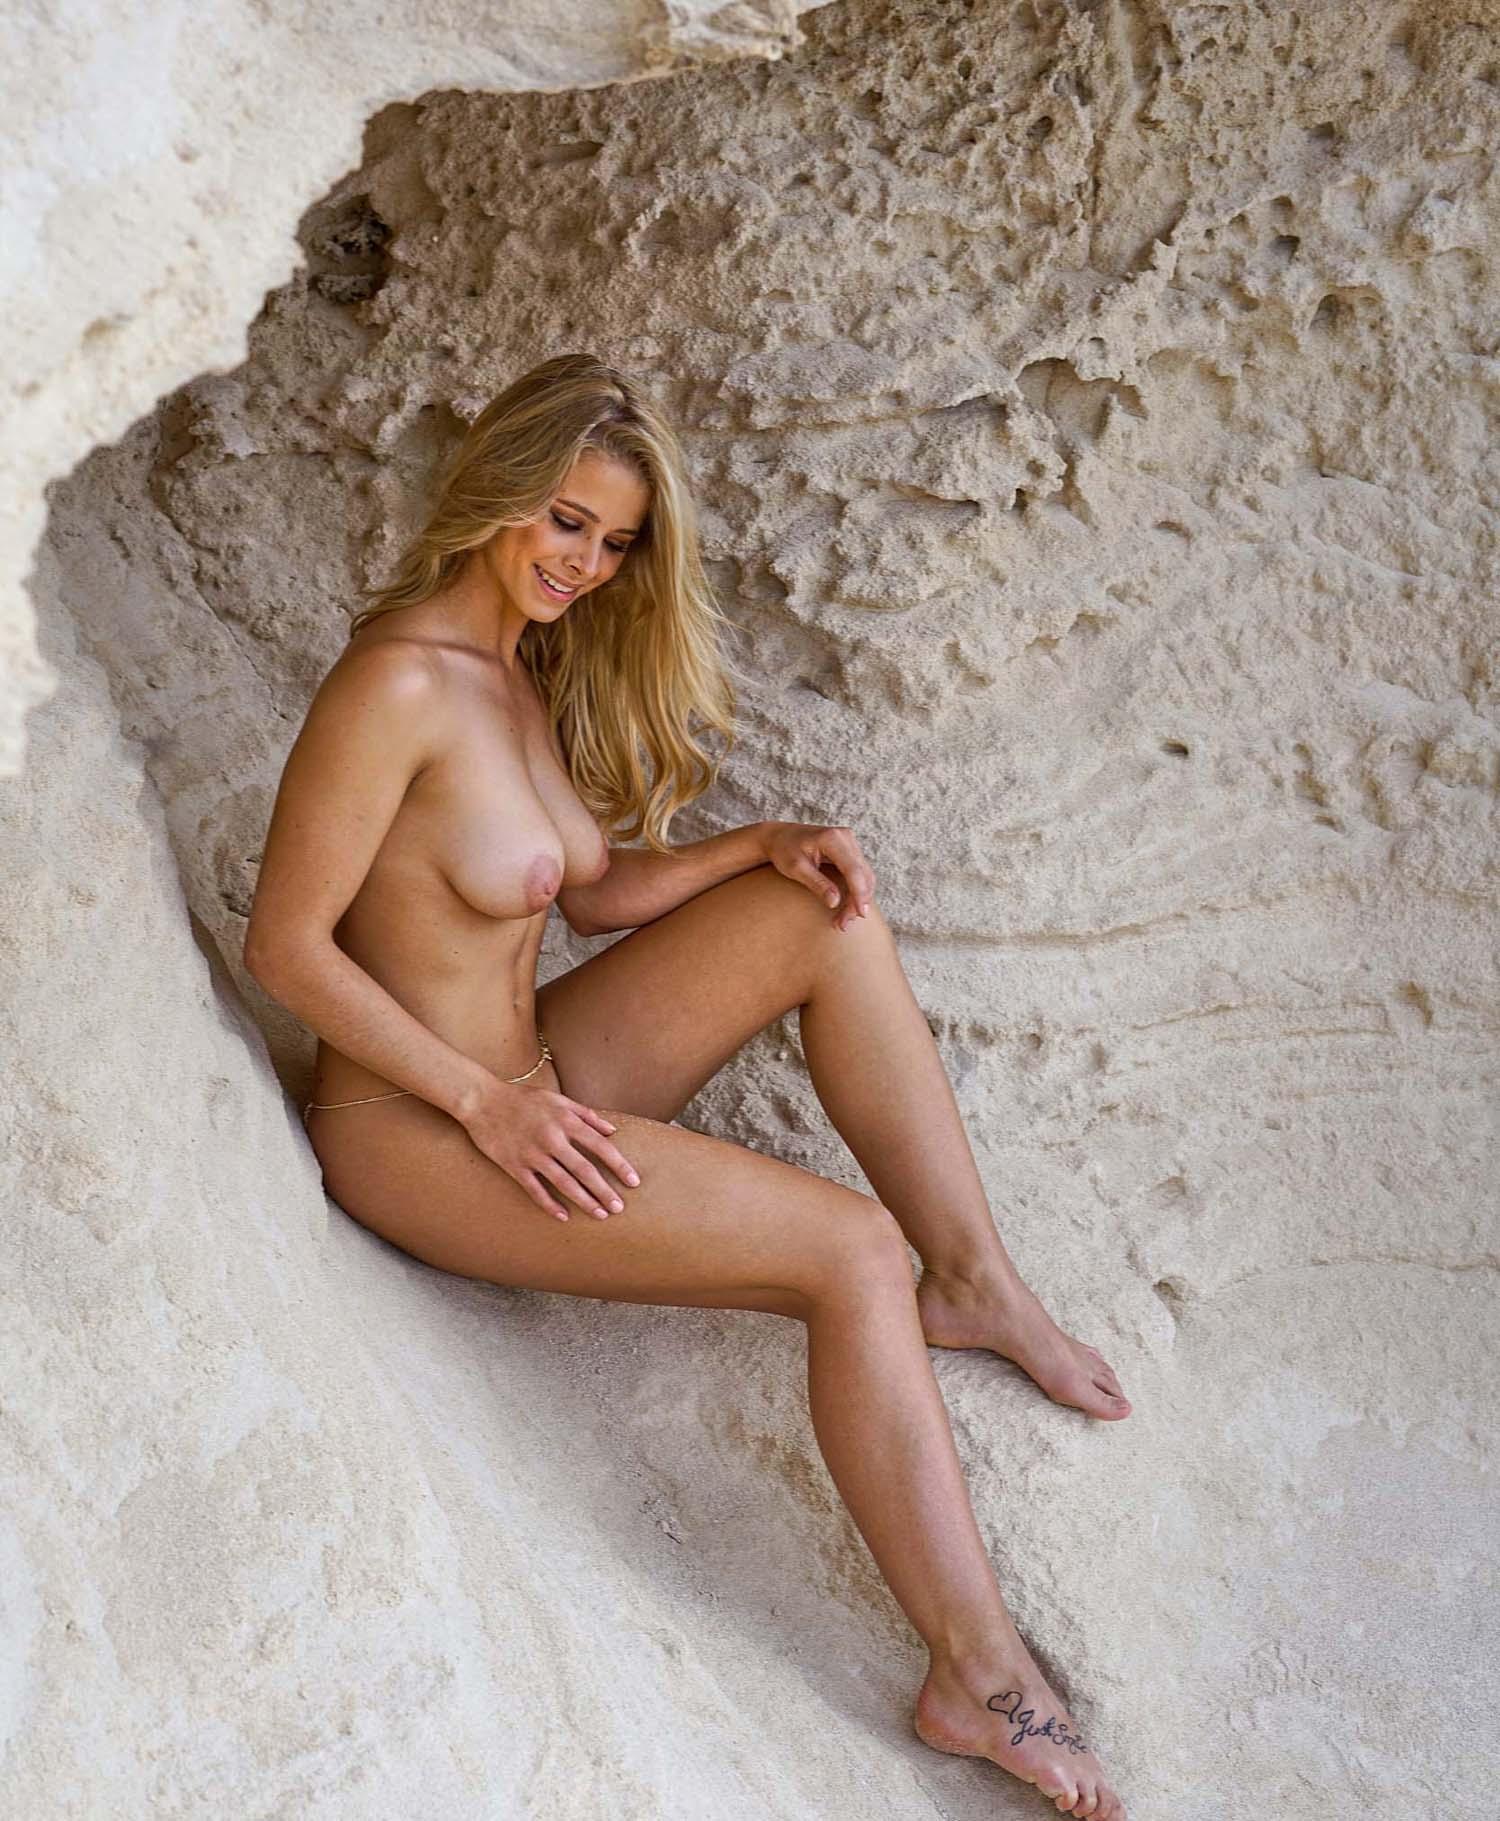 Saskia rosendahl nude